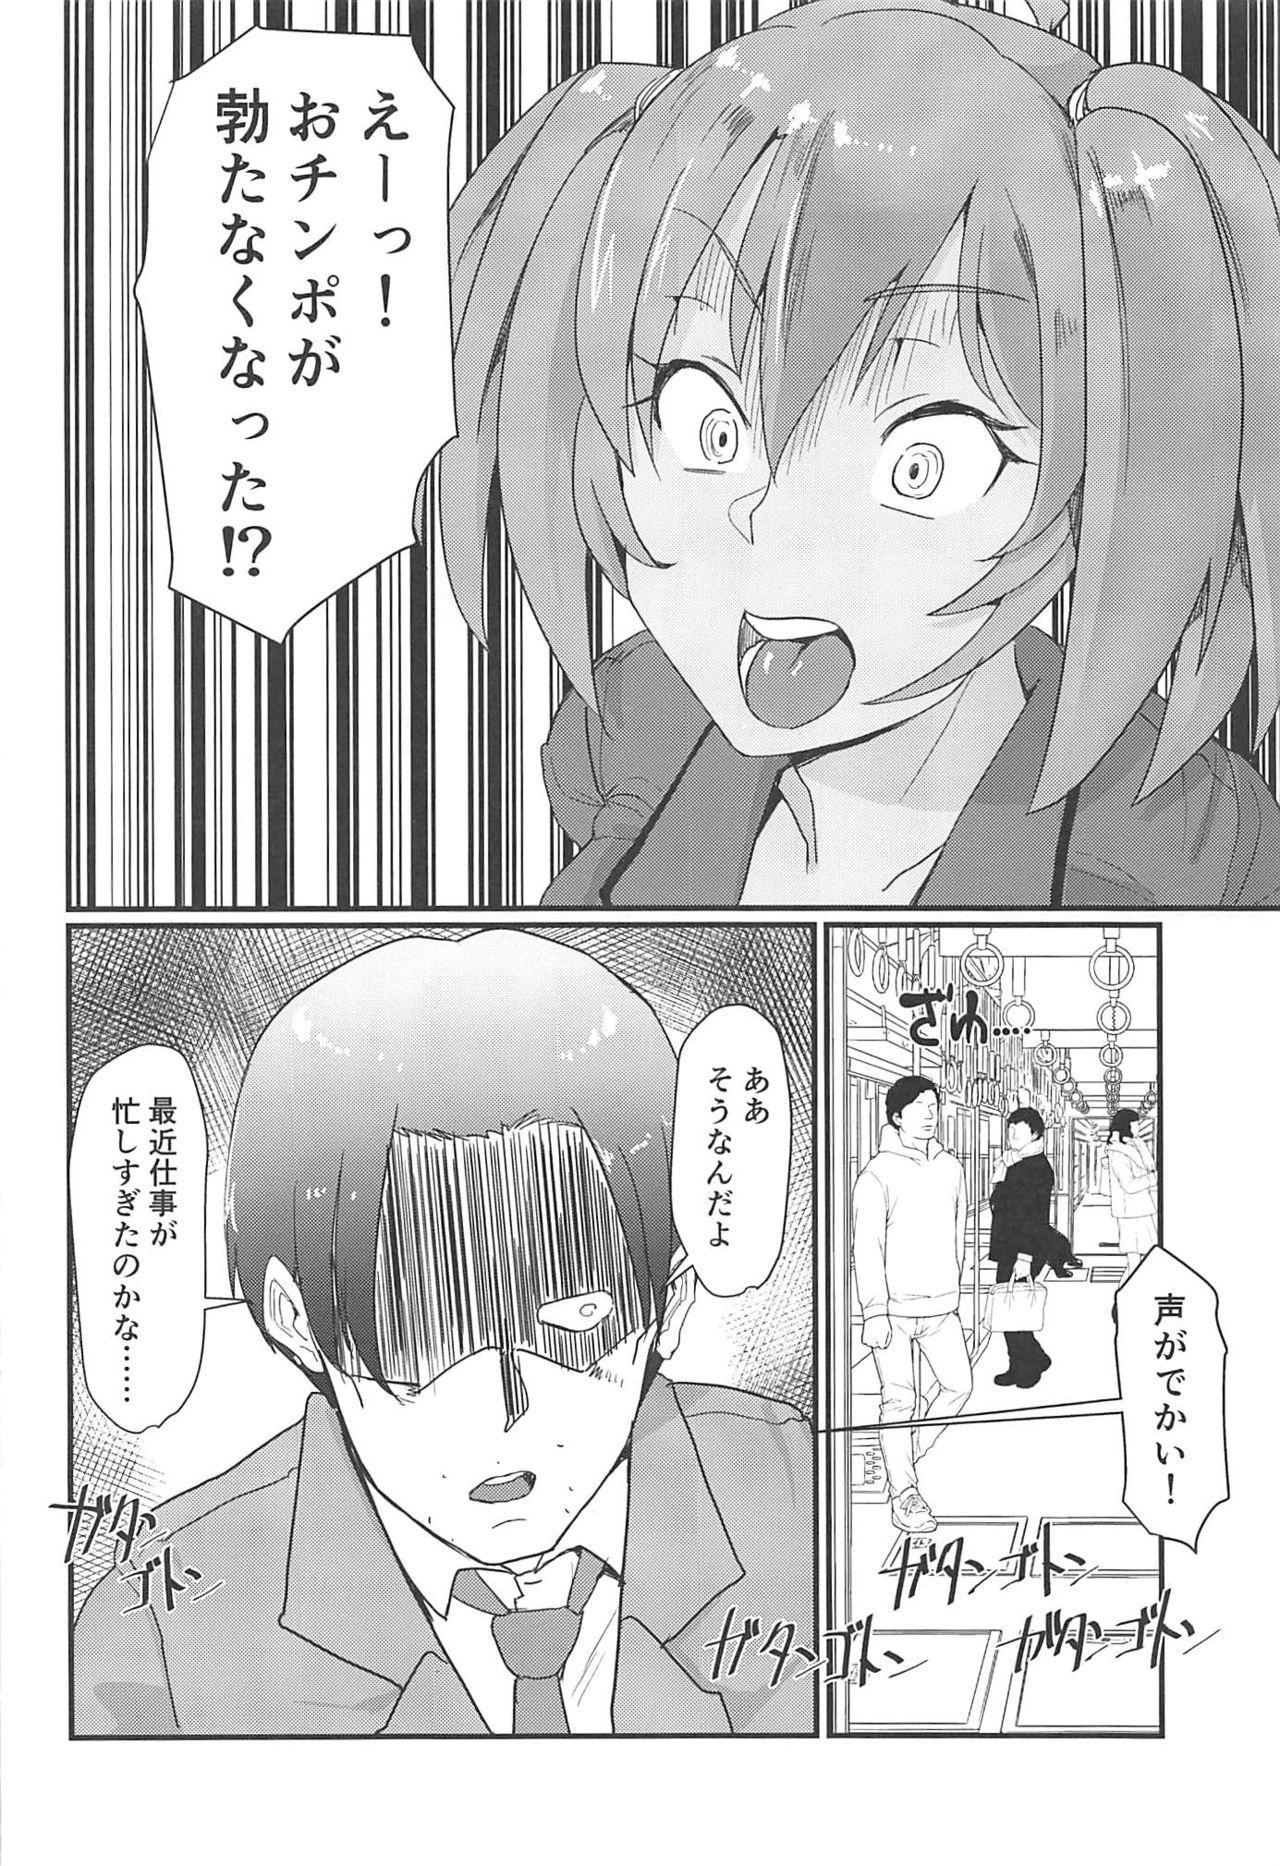 Ryofu Housen to Love Love Ofurox + Nurse Cos 2